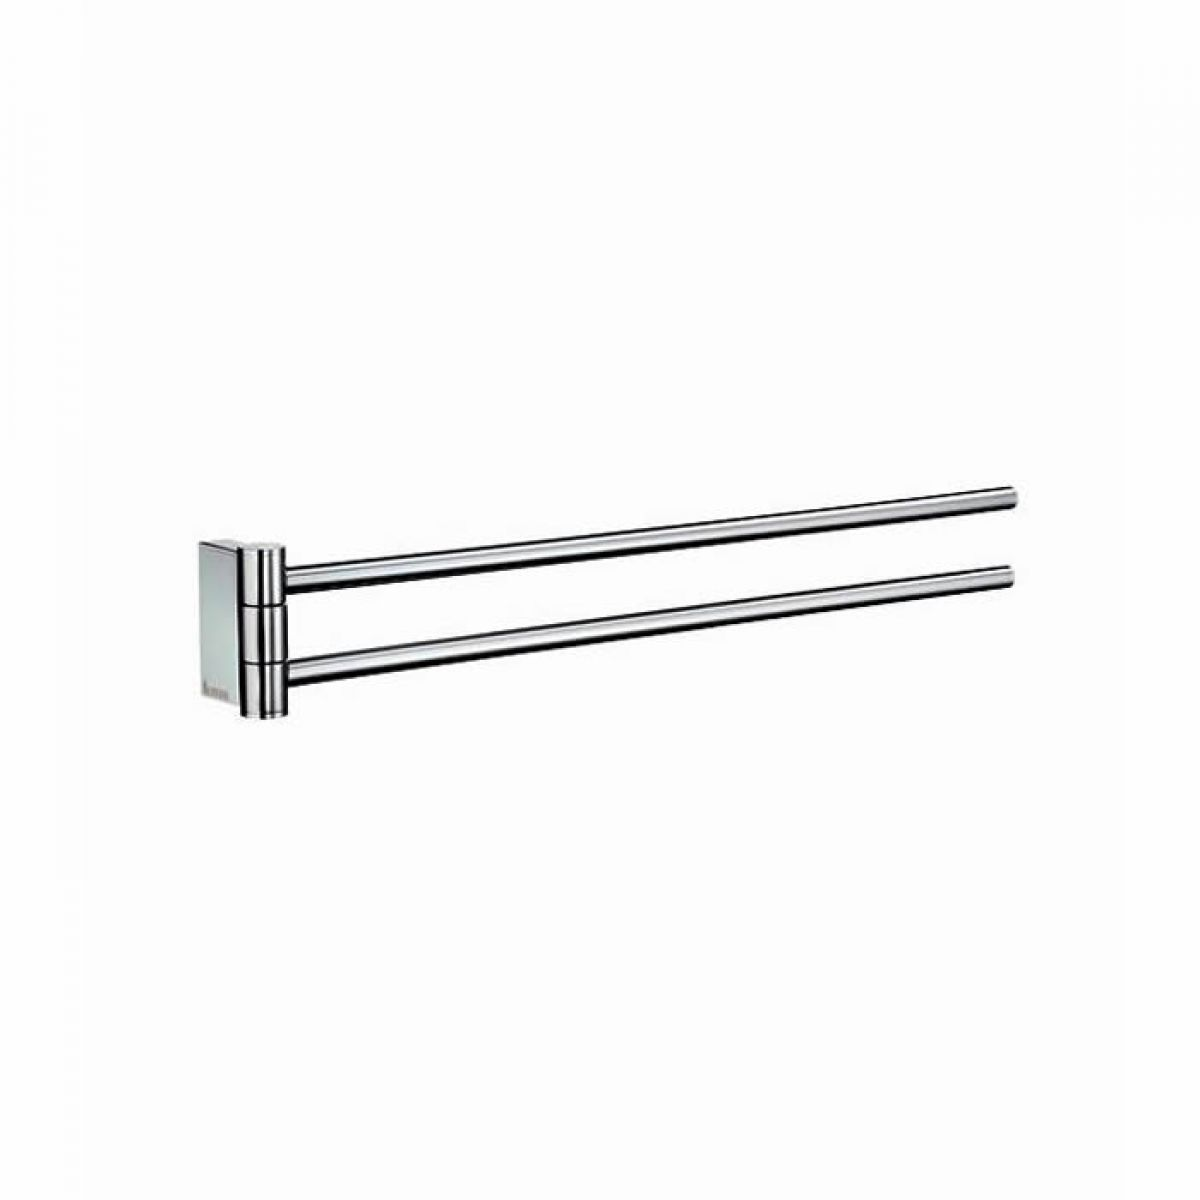 Smedbo air swing arm towel rail ak326 uk bathrooms - Bathroom accessories towel rail ...